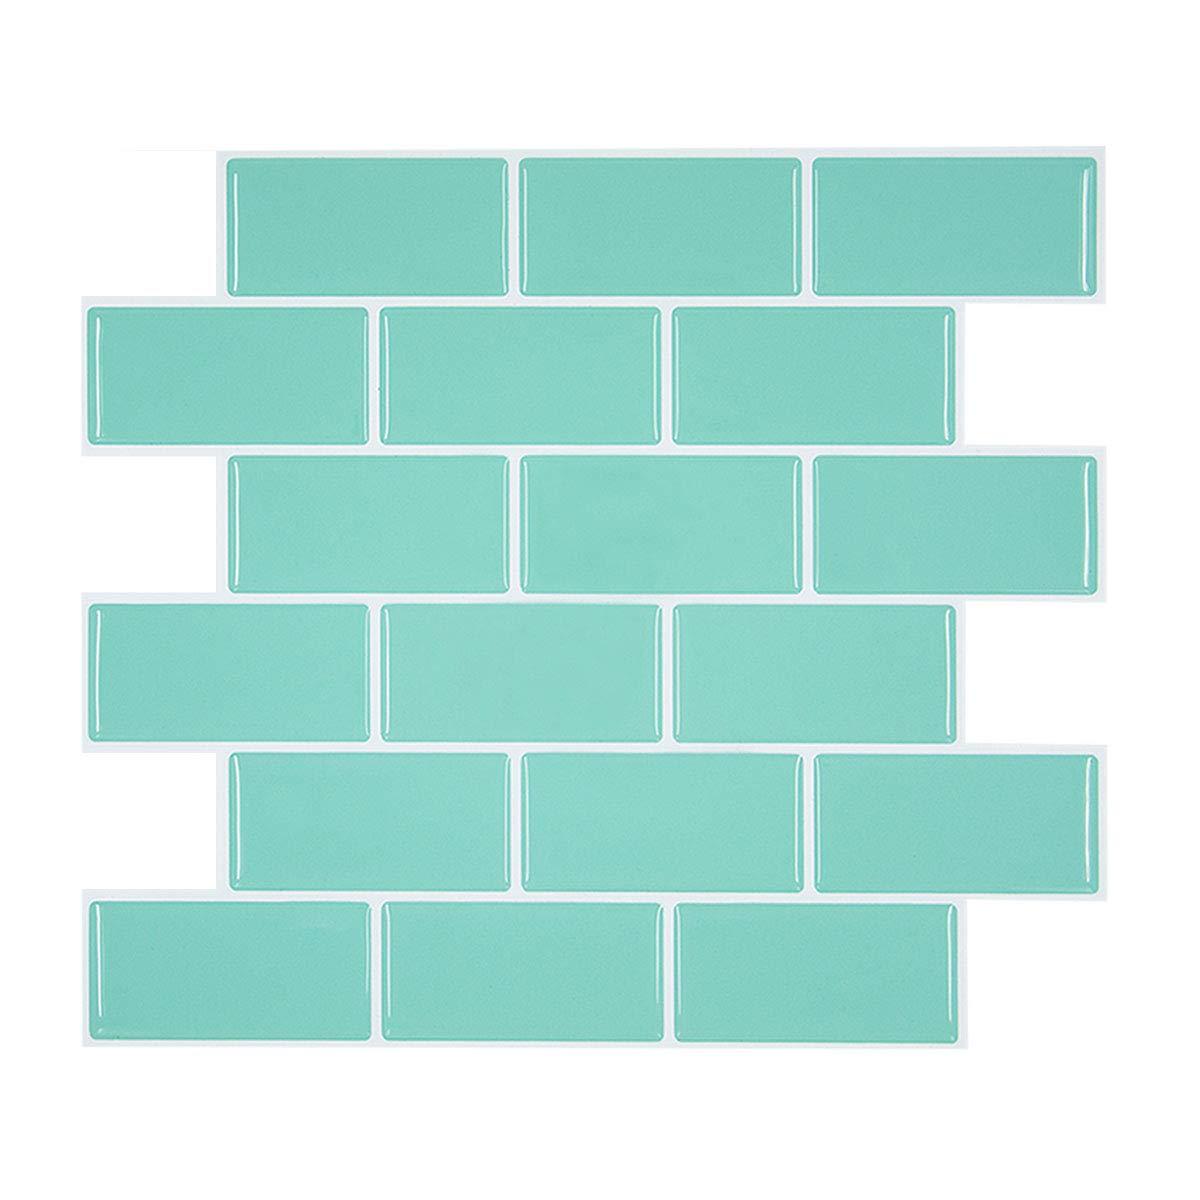 HUE DECORATION Teal Peel and Stick Subway Tile Backsplash for Kitchen & RV Room, Anti Mold Peel and Stick Tile Backsplash for Rental Apartment 11.26'' x 10'' Pack of 4